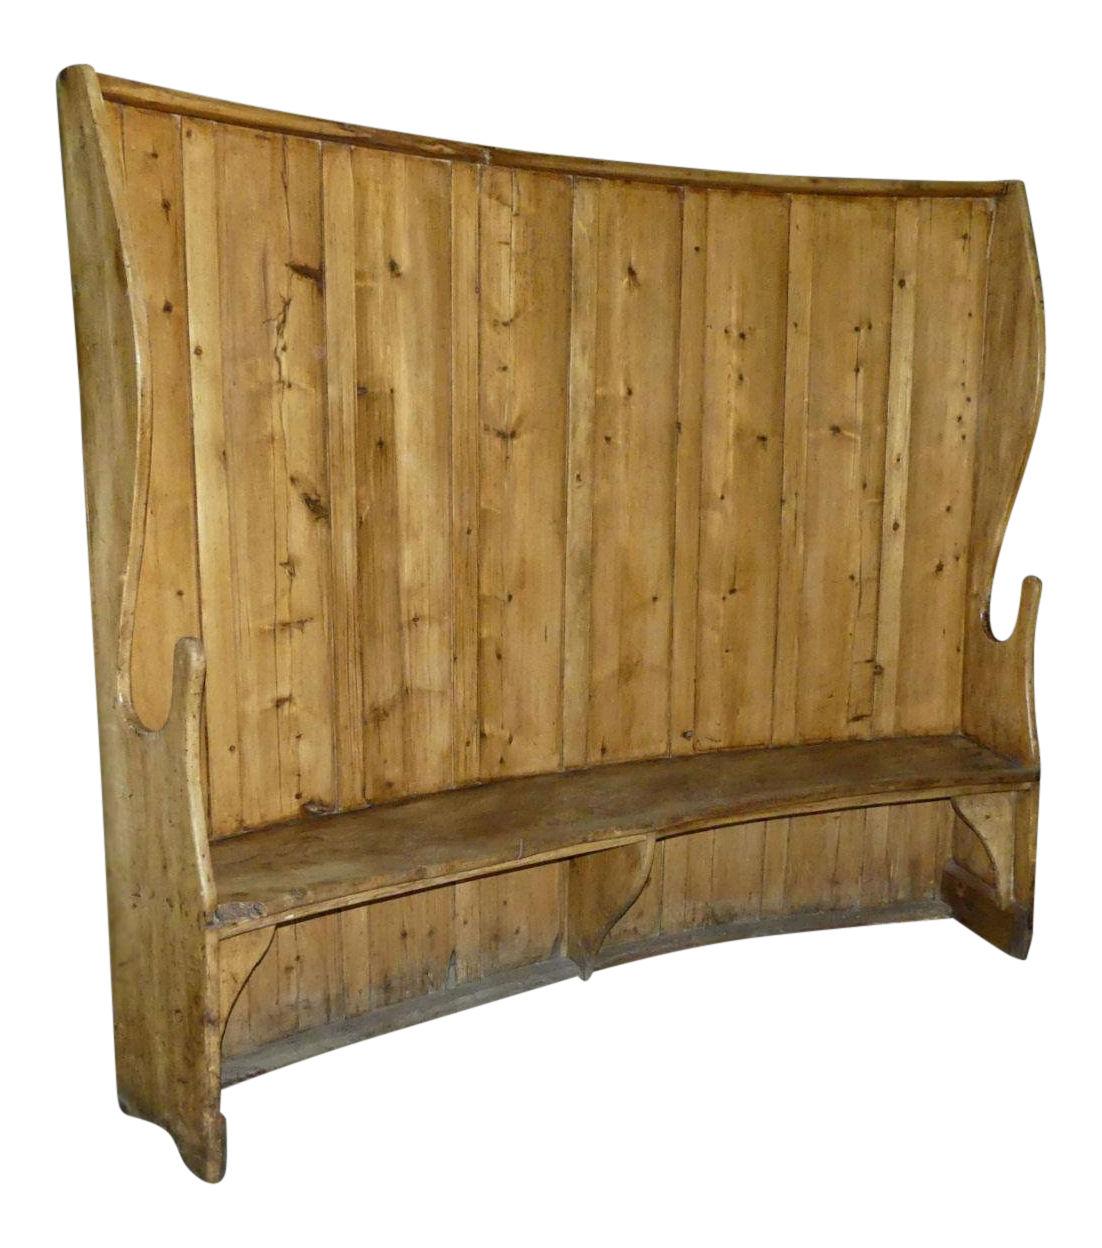 SOLD Antique High-Back Pine Bench